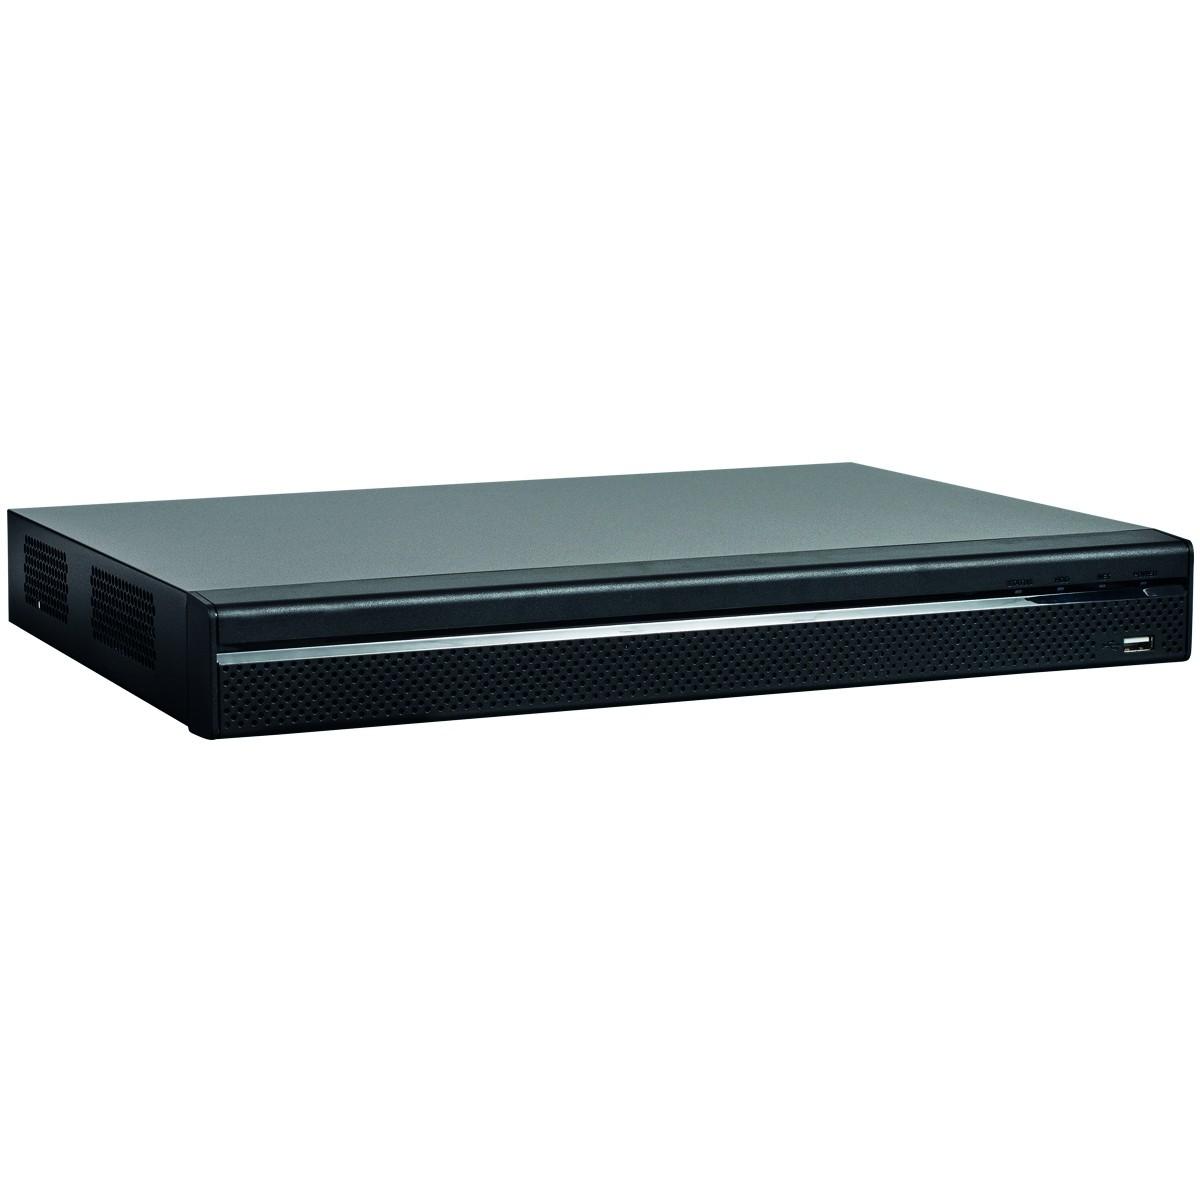 TURM Professional HDCVI 32 Kanal XVR ProAI Rekorder 5 MP, Penta-brid HDCVI/AHD/TVI/CVBS/IP, 2xSATA j